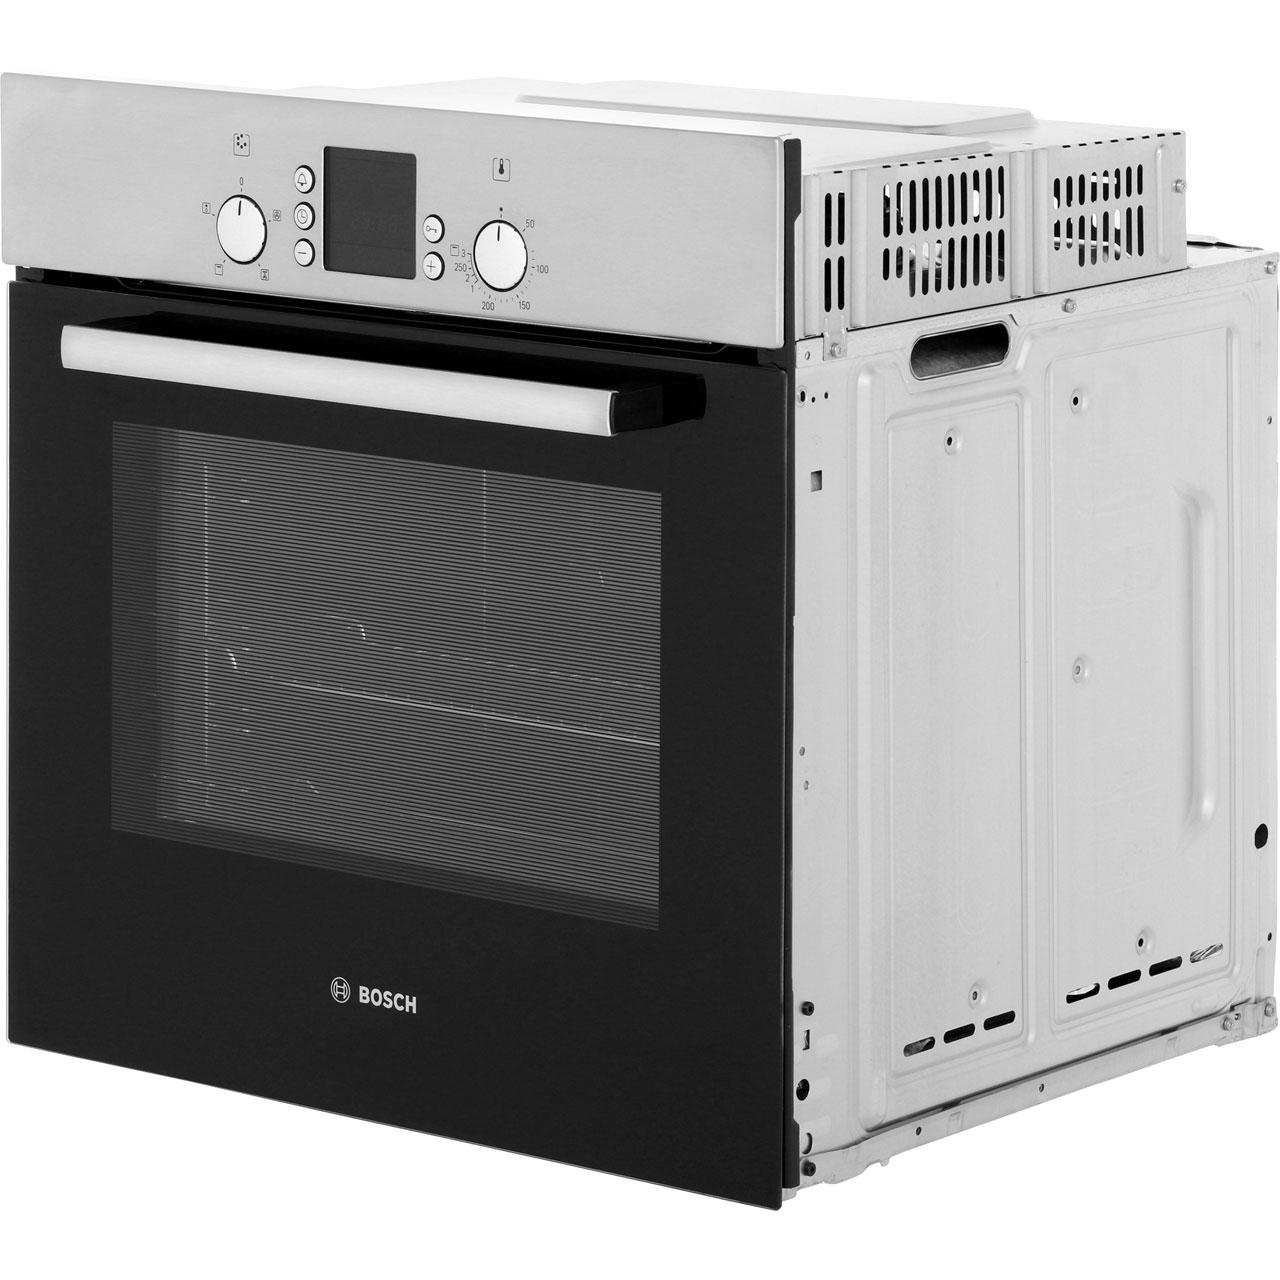 Boots kitchen appliances washing machines fridges more for Backofen bosch